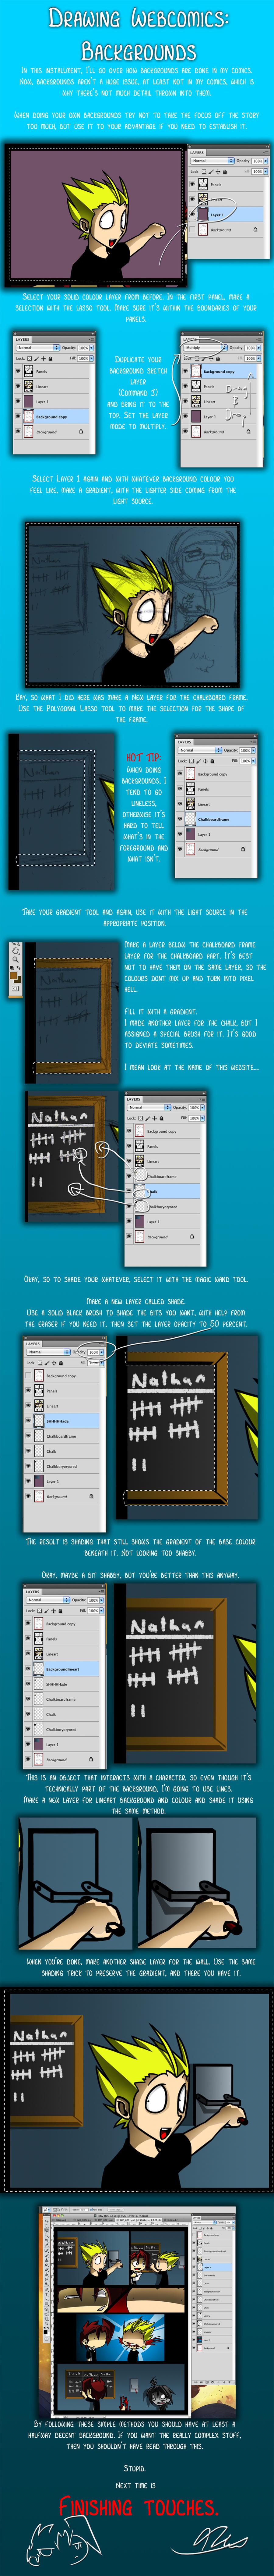 Webcomics: Backgrounds by DukeStewart